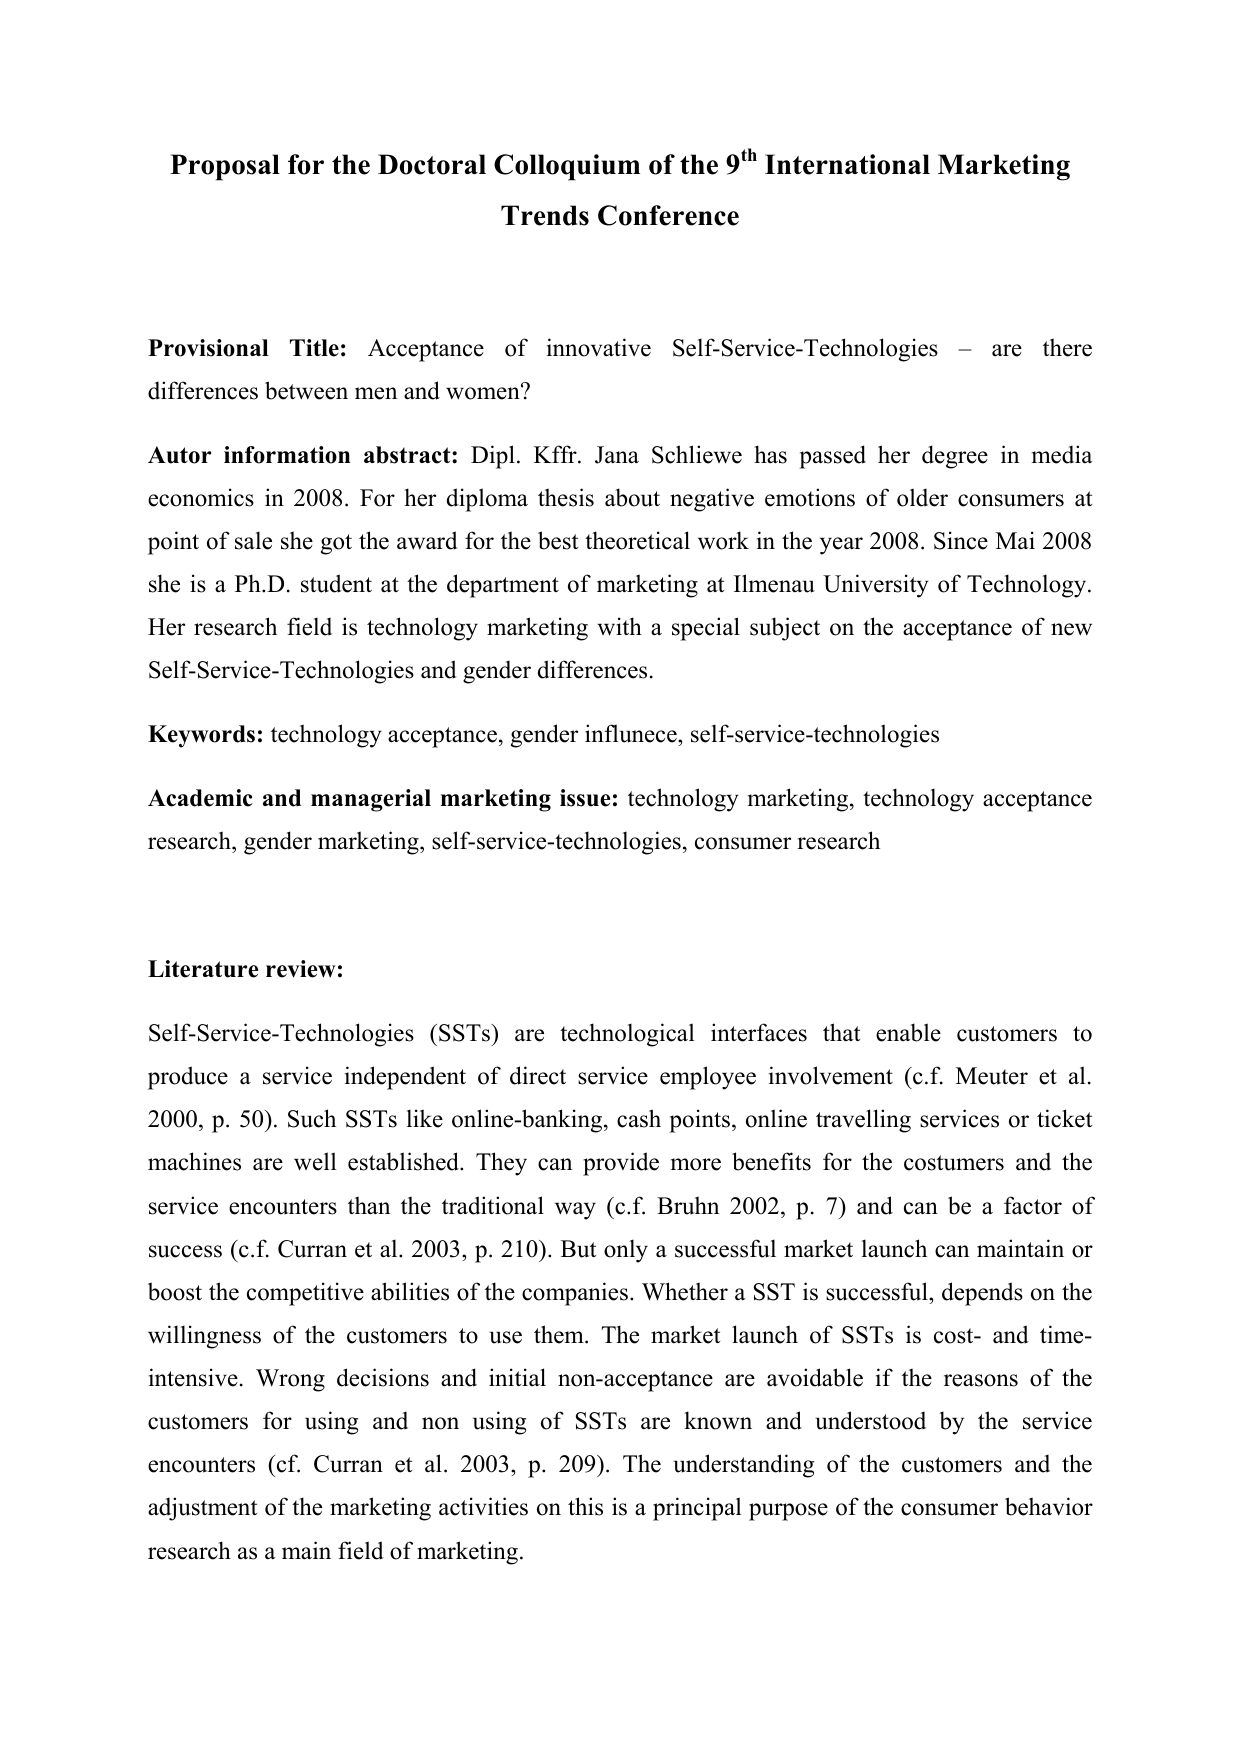 Phd thesis on international marketing